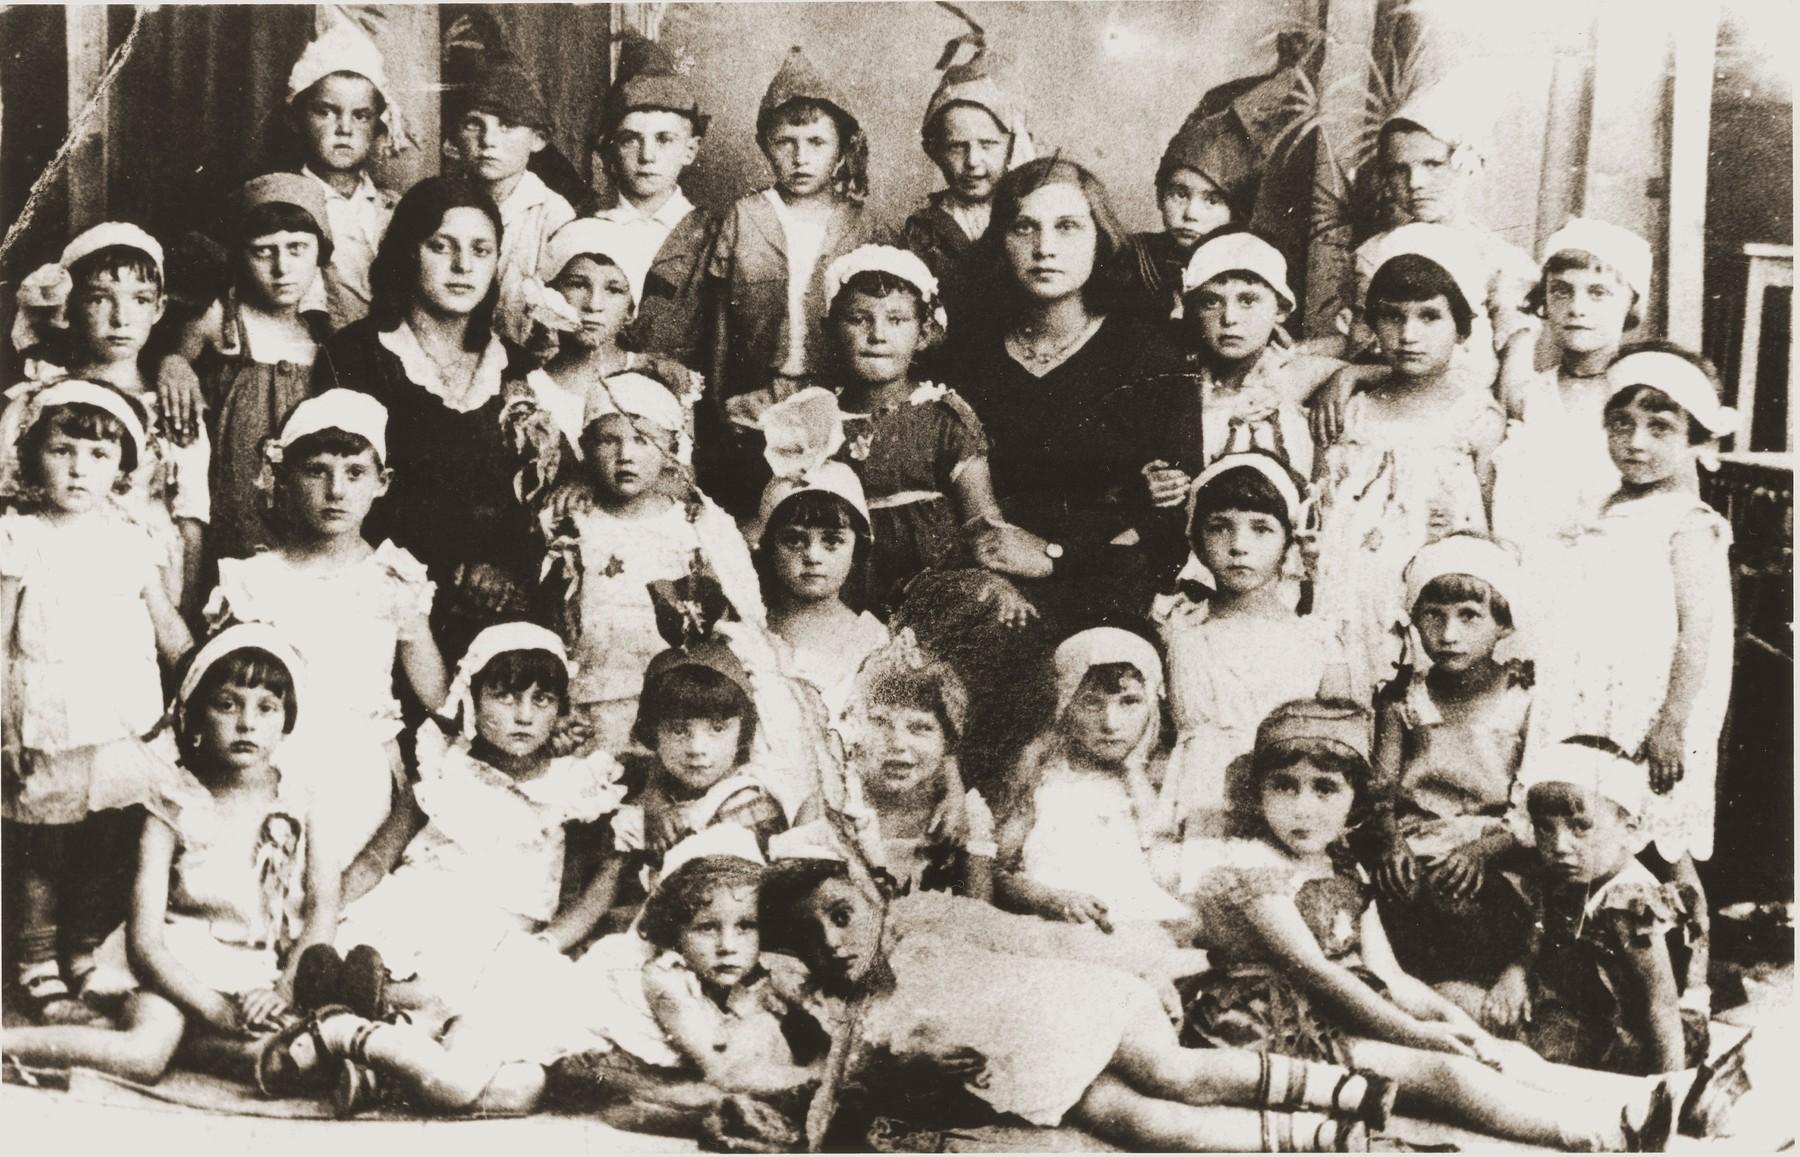 Jewish kindergarten class in Smorgon, Poland.  Those pictured include Leah Kovarski, Etka Rabinovitch, Leika Arotzka, Esther Goldberg, Nechama Ziskovitch, Bela Kovarski, Masha Schwartz, Tania Marcus, Rachel Yentes and Masha Levine.  Only the last three survived.